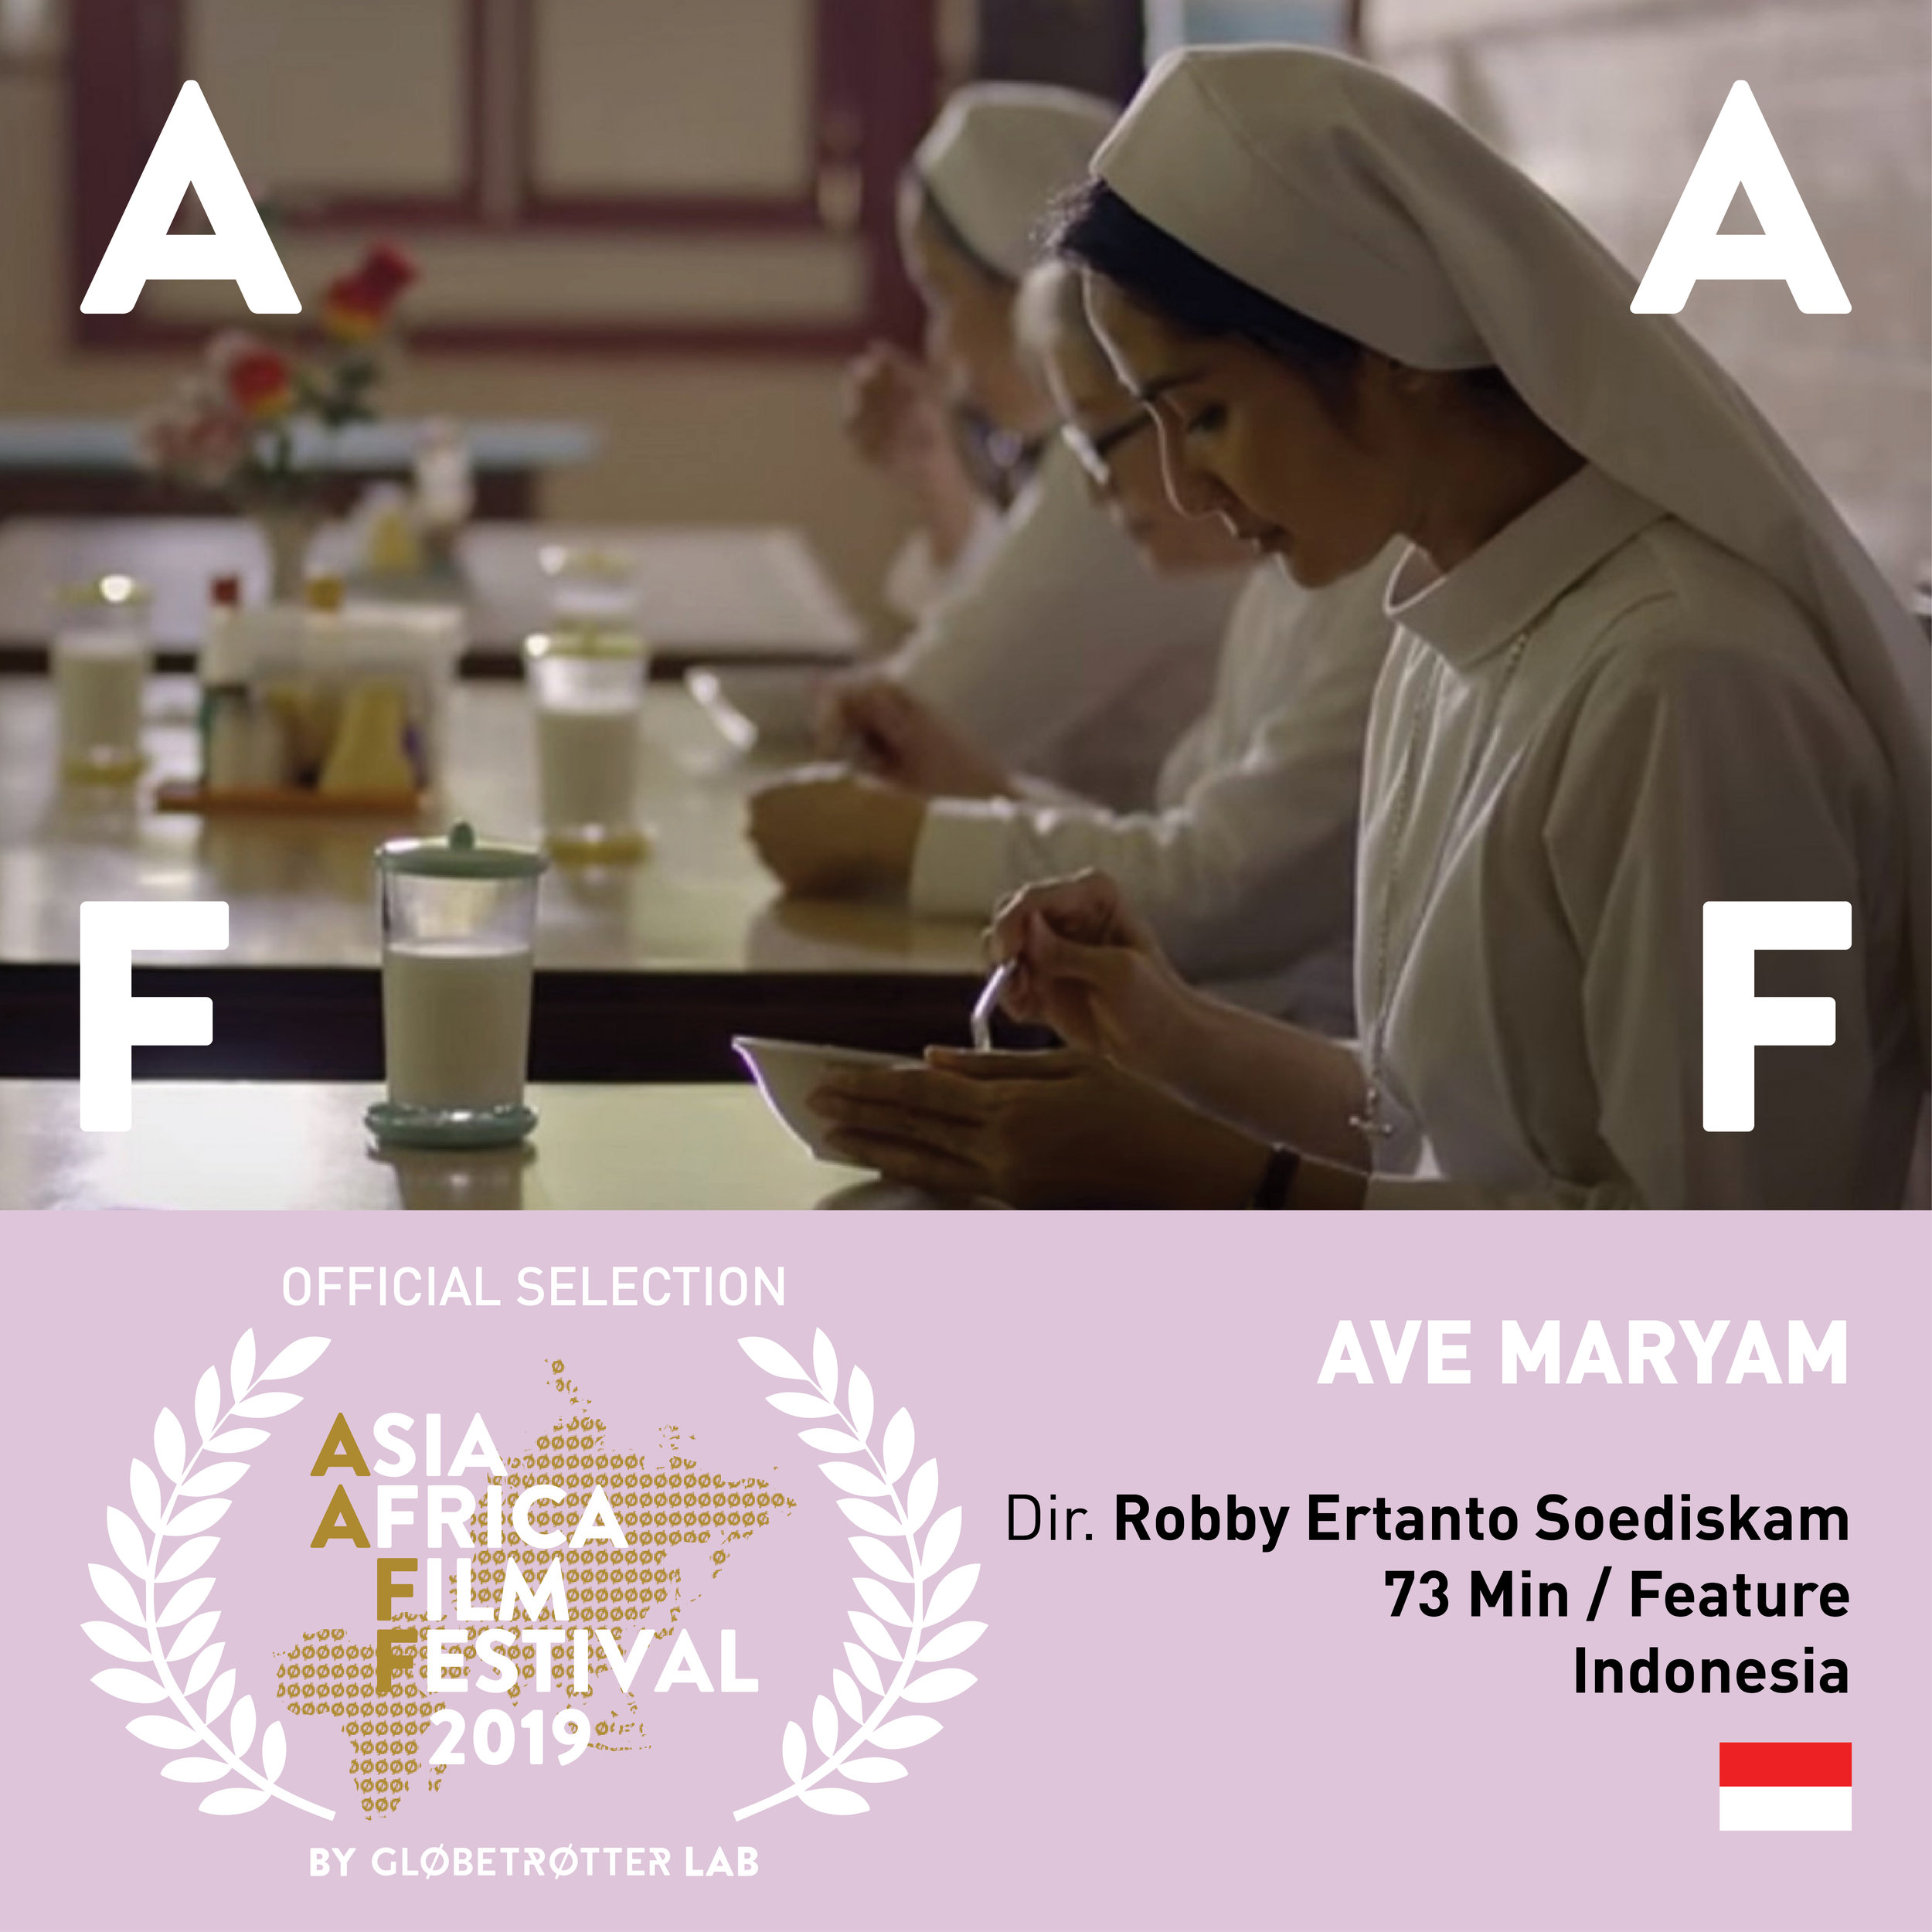 AAFF Post - Ave Maryam.jpg